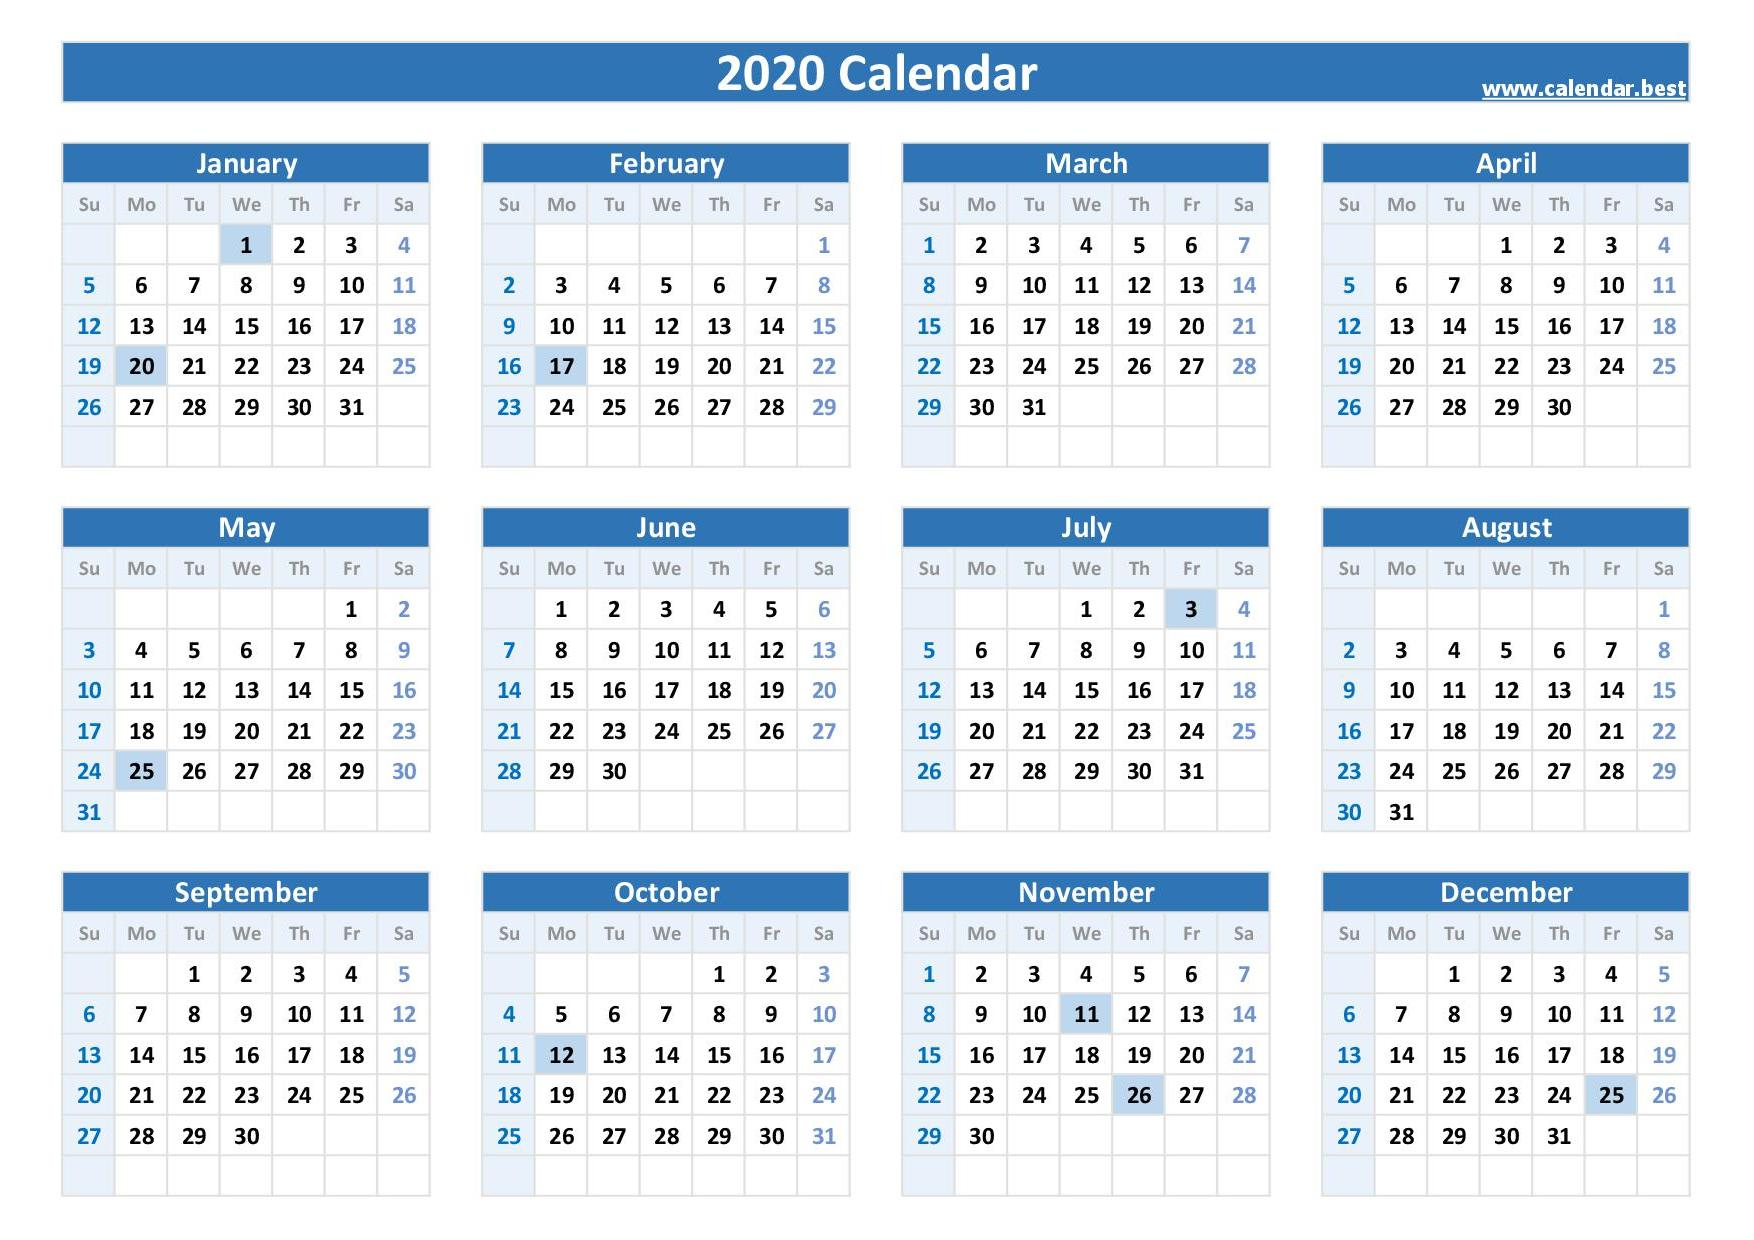 2023 And 2022 Calendar With Holidays.2020 2021 2022 2023 Federal Holidays List And Calendars Calendars Best